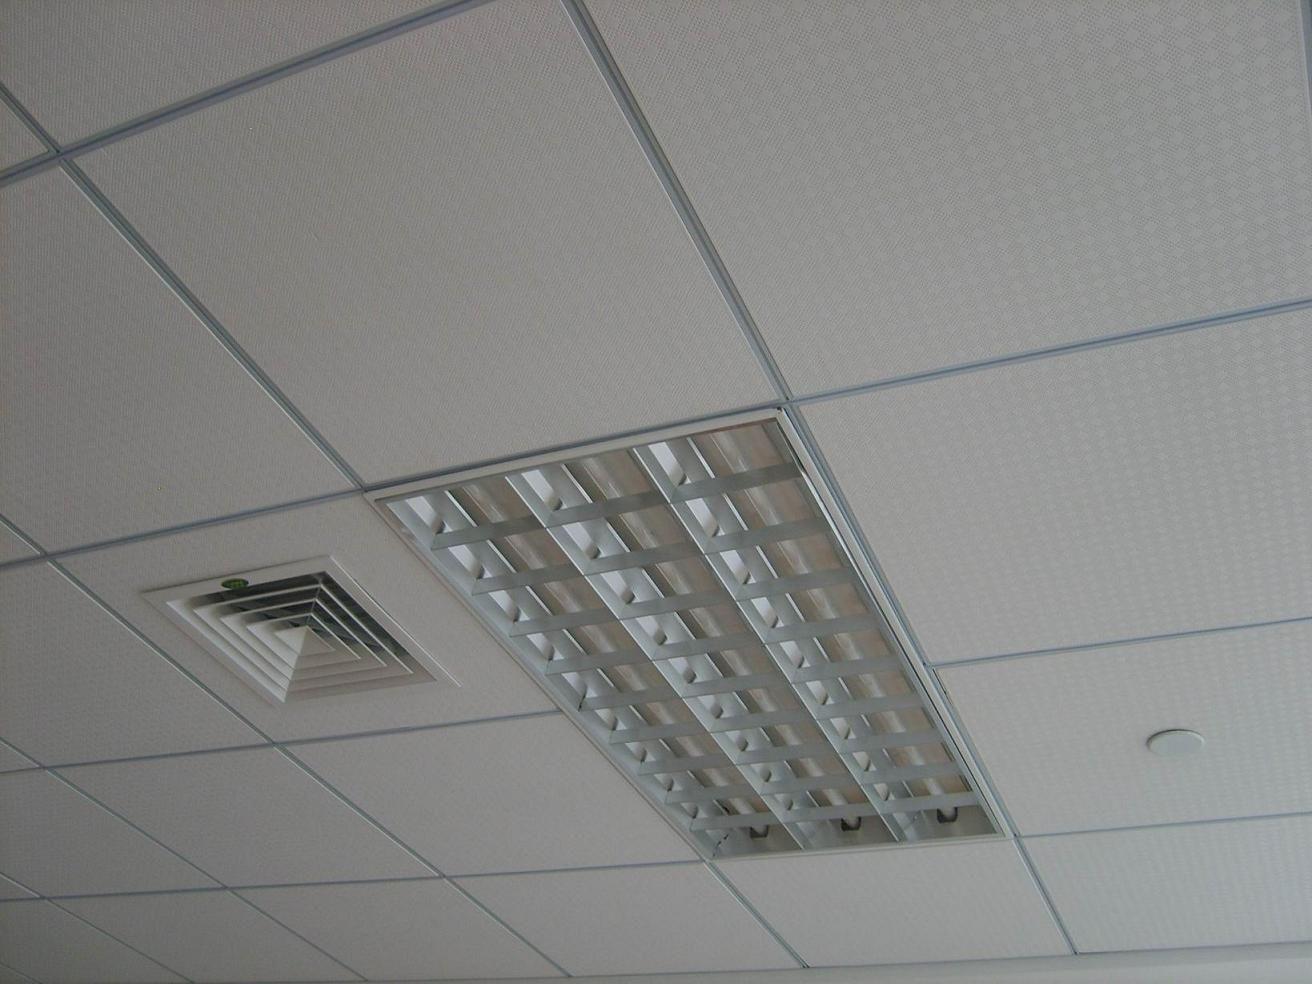 Gypsum Board Ceiling Tiles Ceiling Design Ideas Pinterest